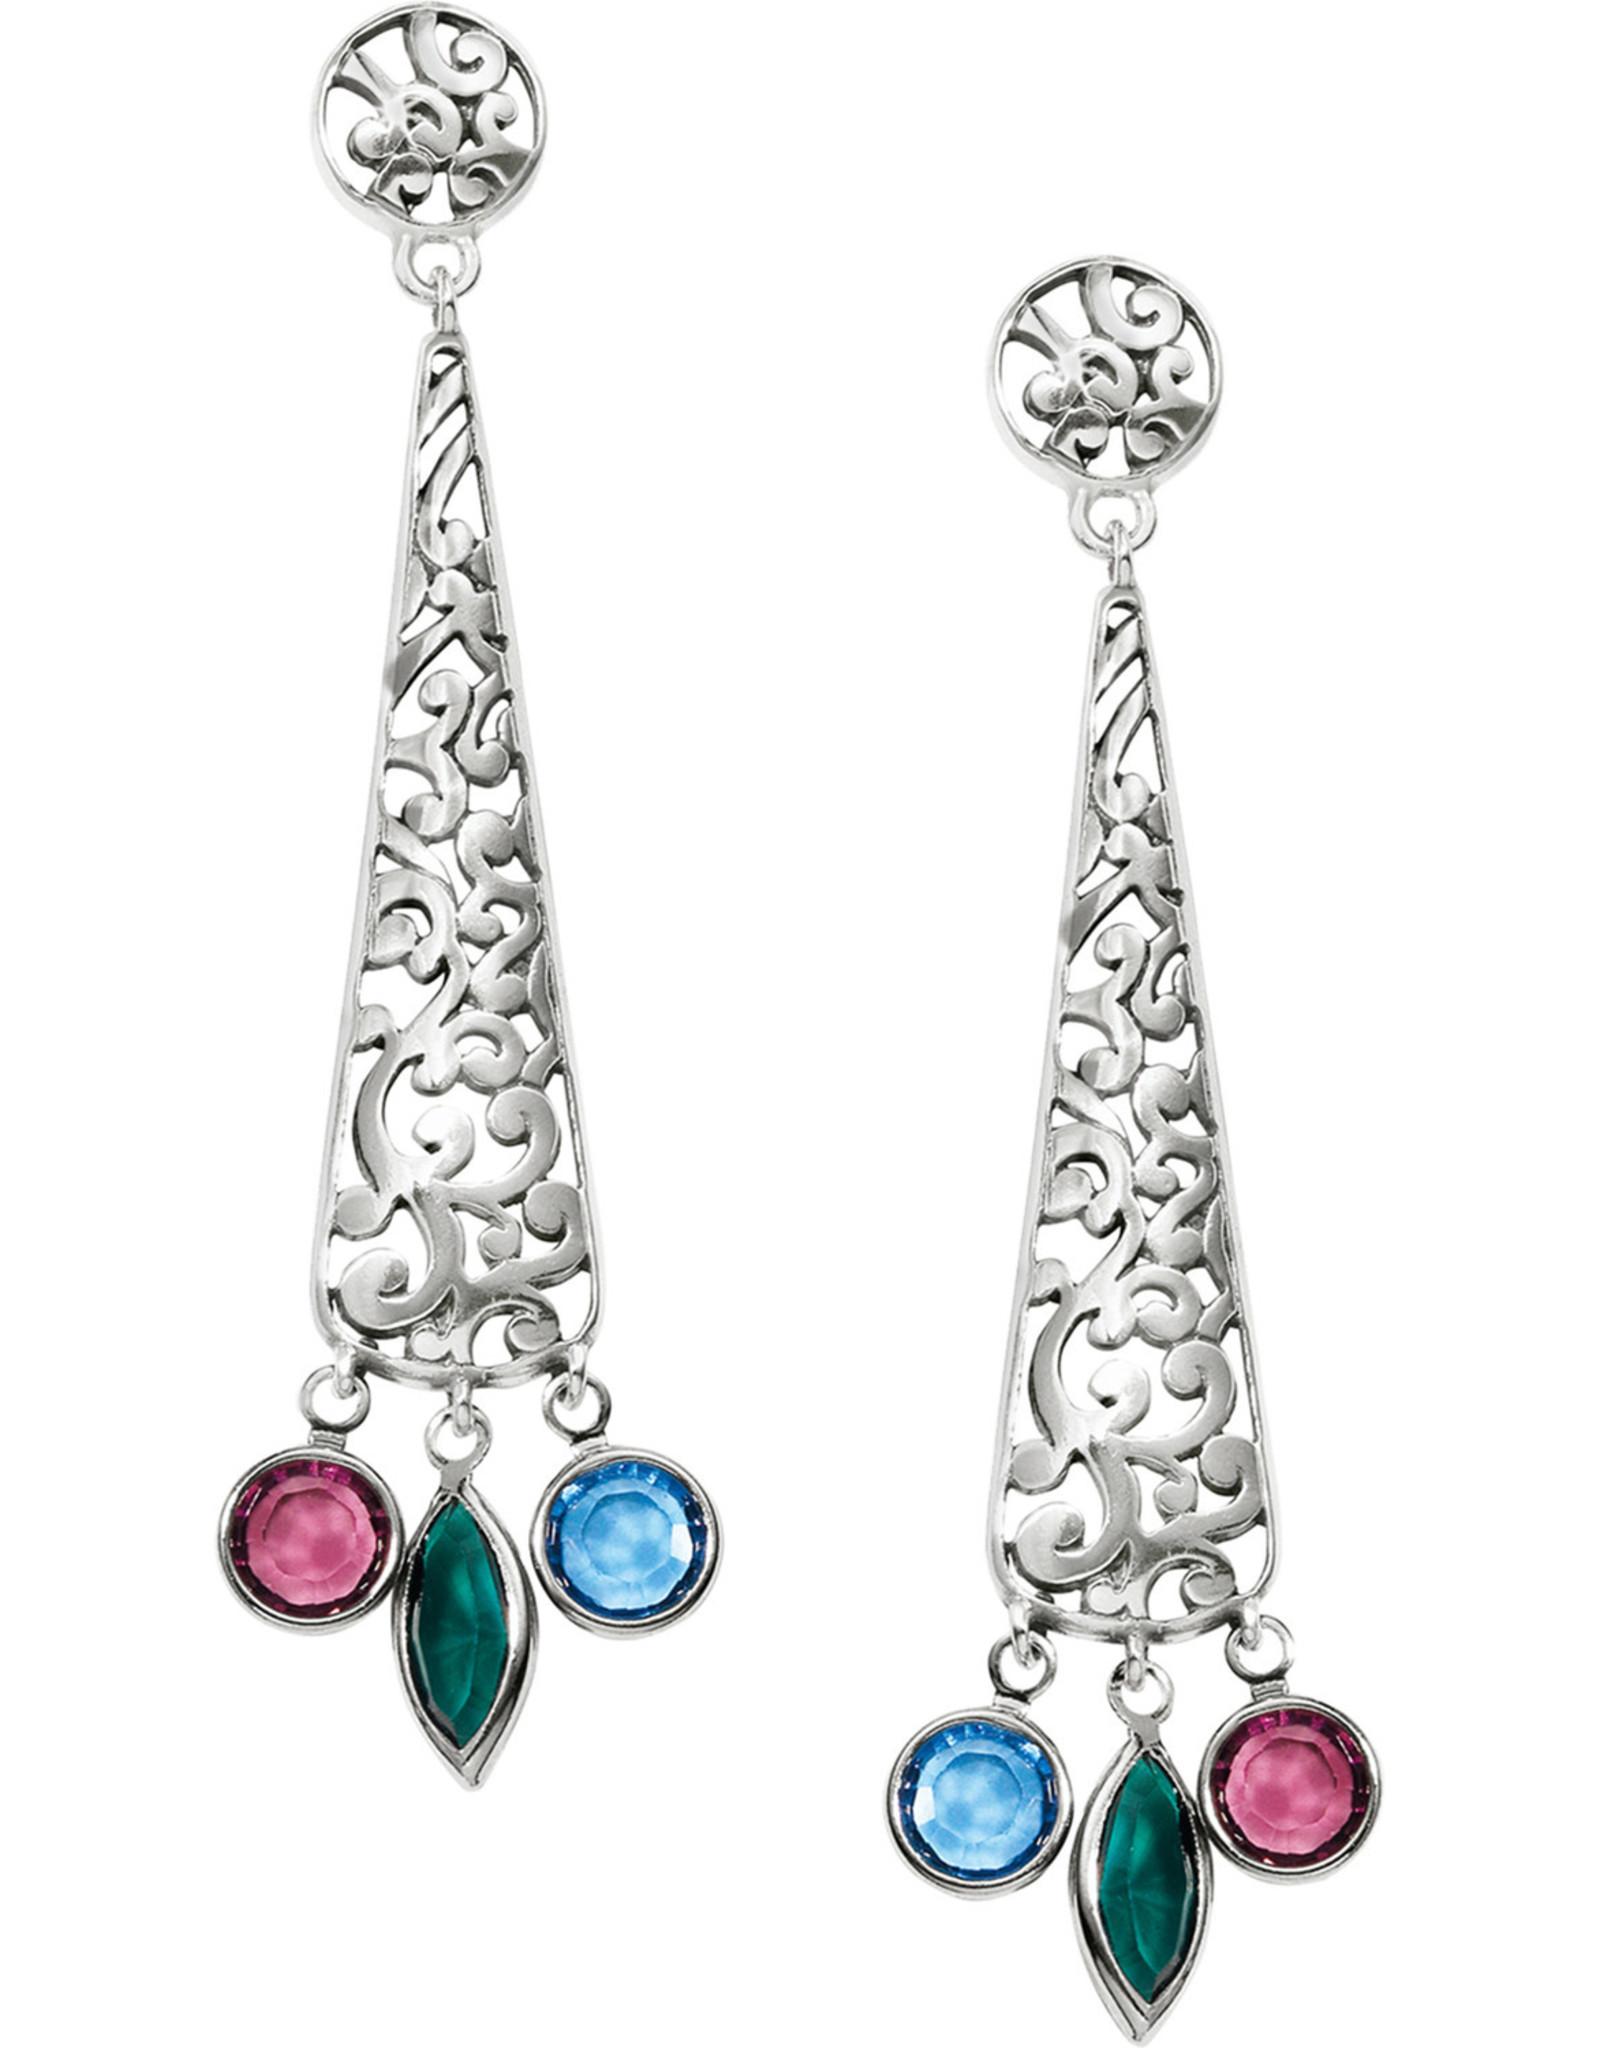 Brighton Brighton earrings Elora Gems Post